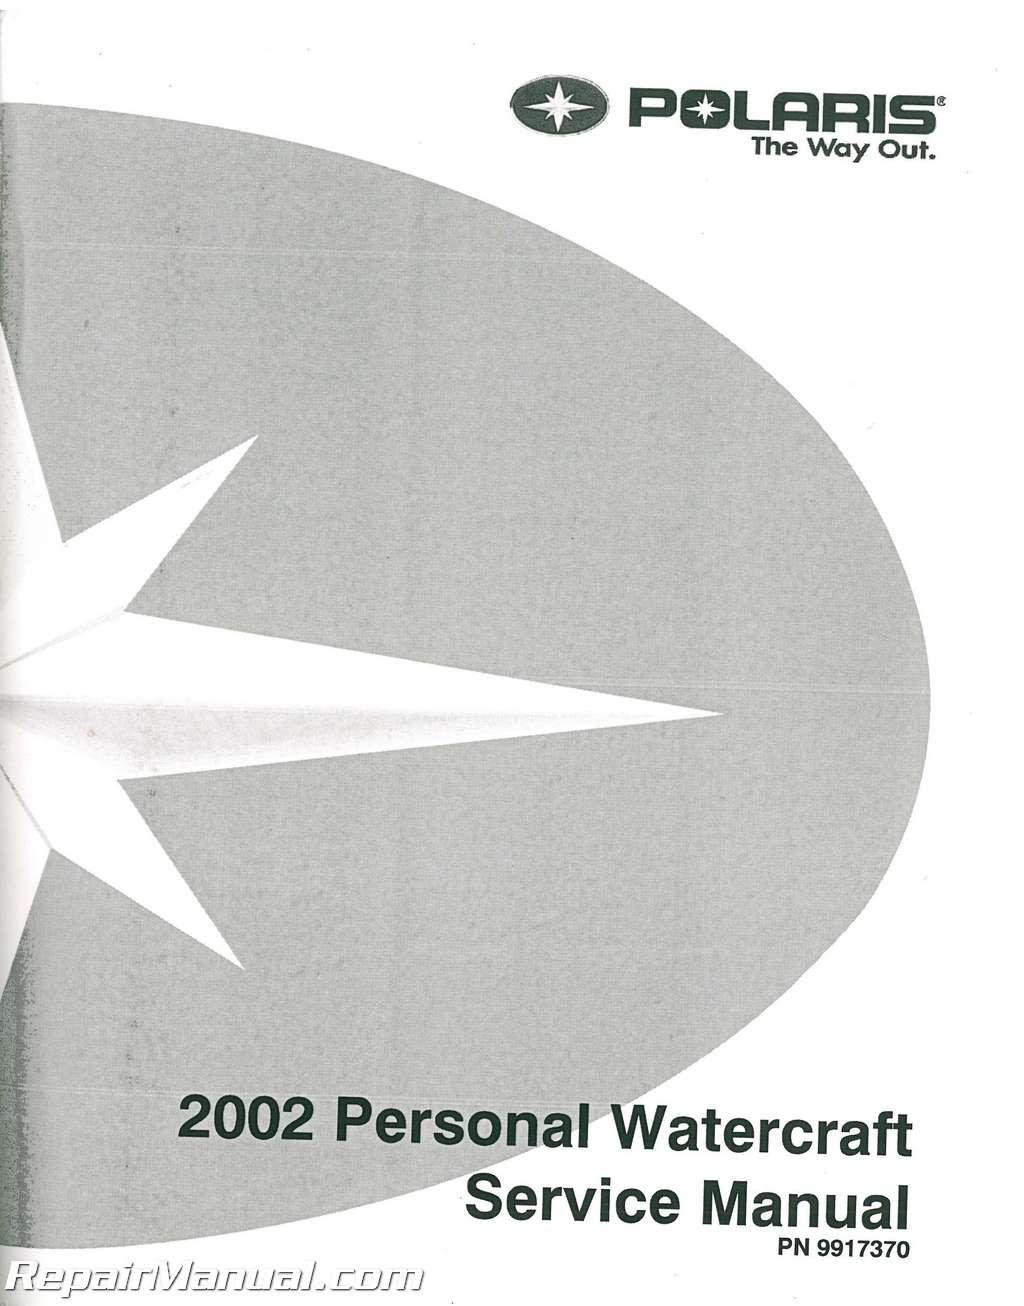 2002 Polaris Personal Watercraft Service Manual border=